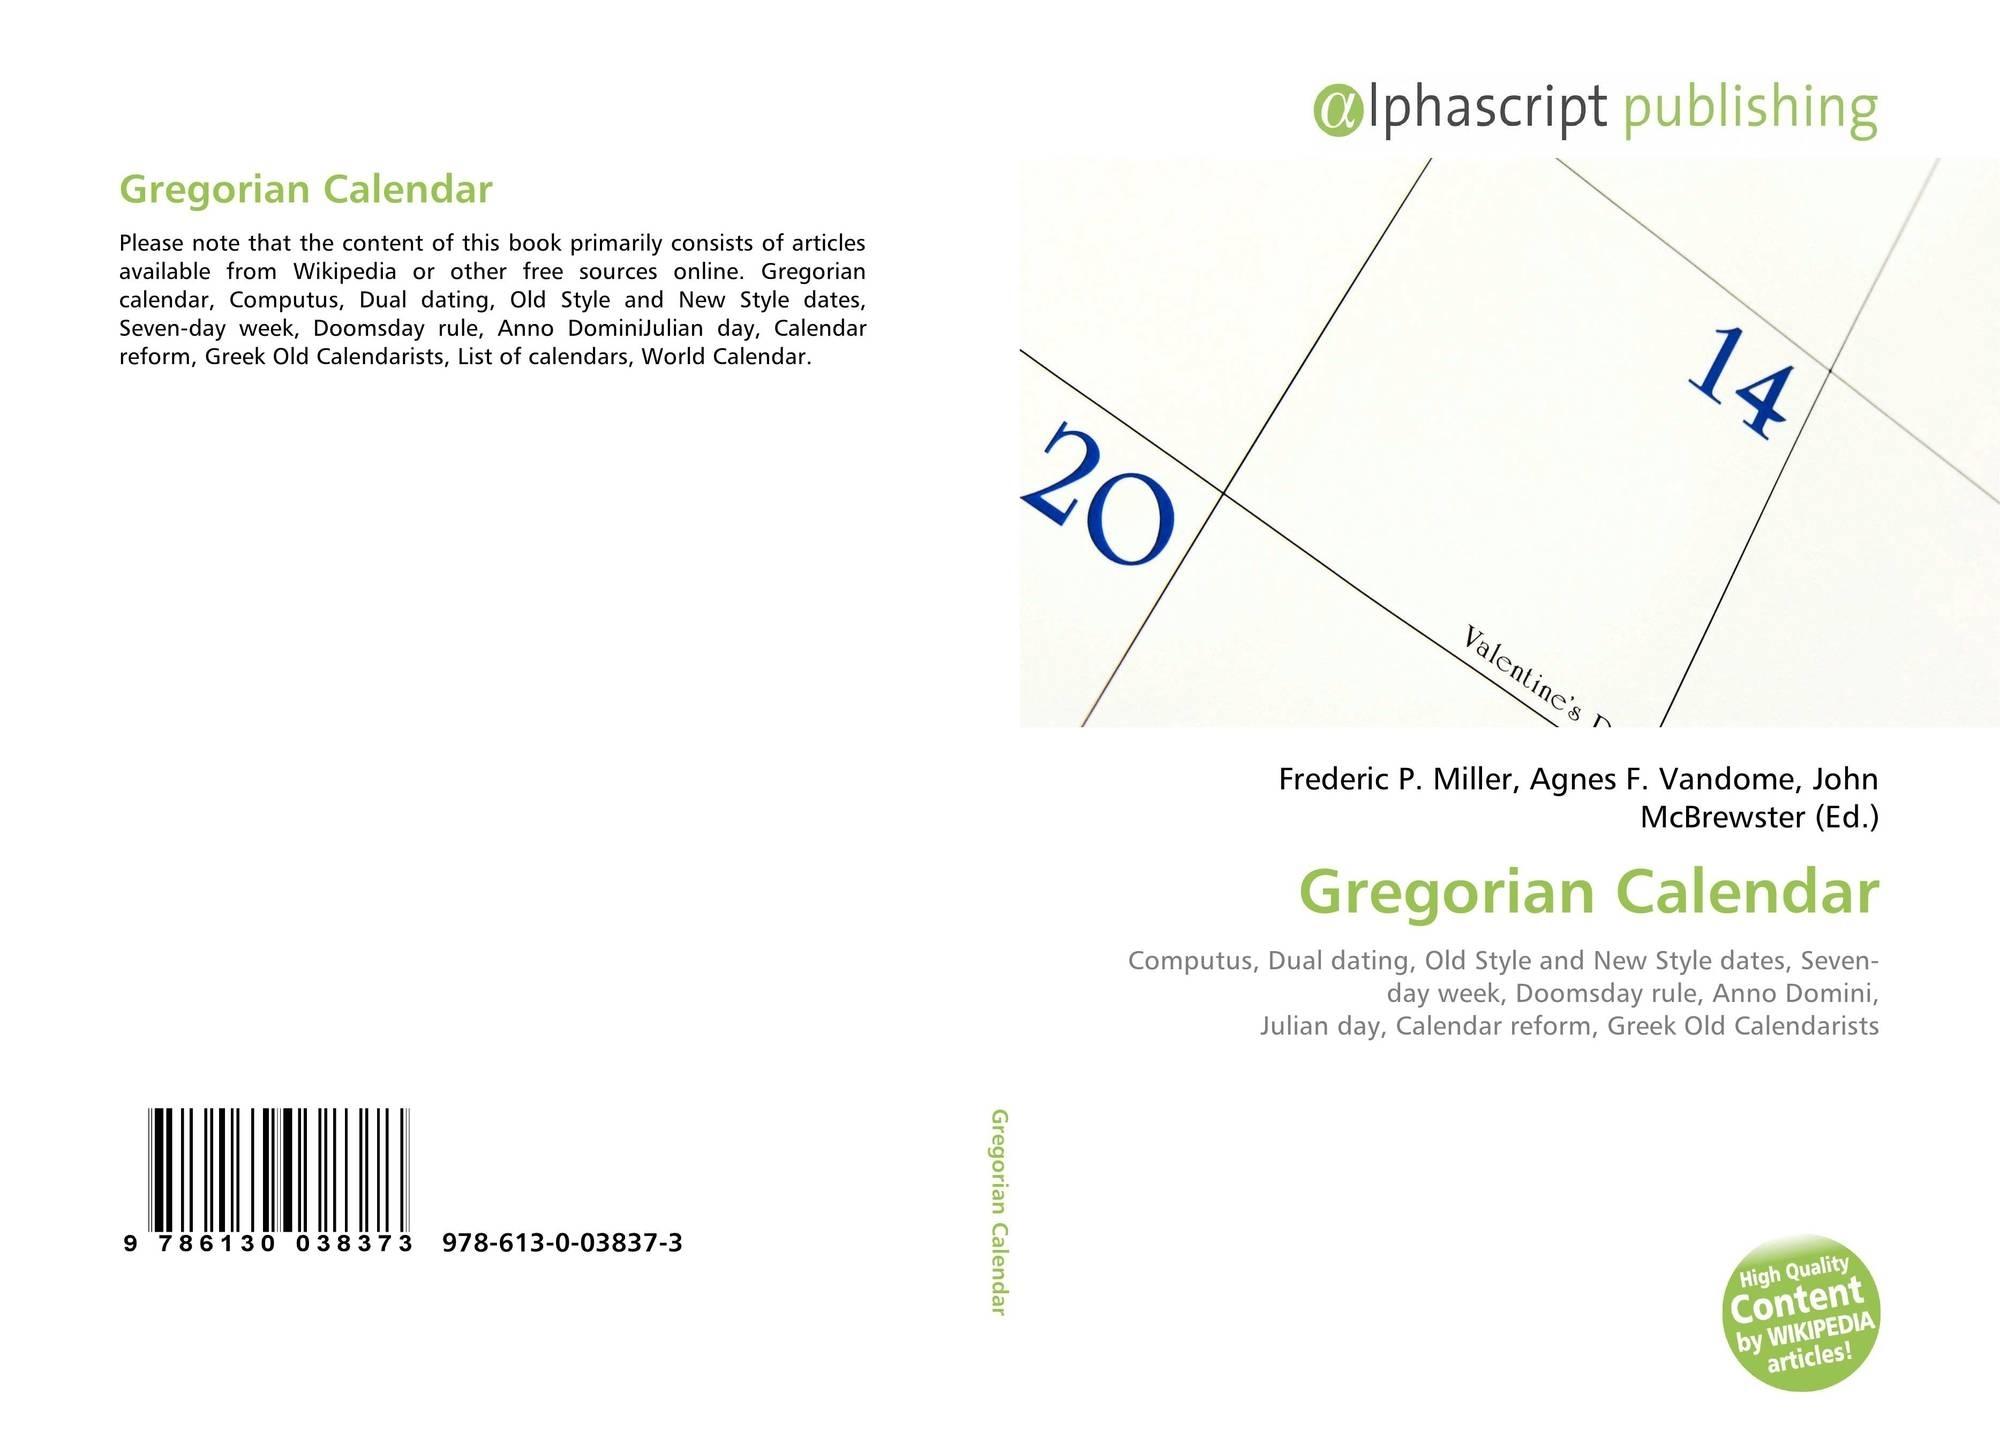 Gregorian Calendar, 978-613-0-03837-3, 6130038372 ,9786130038373